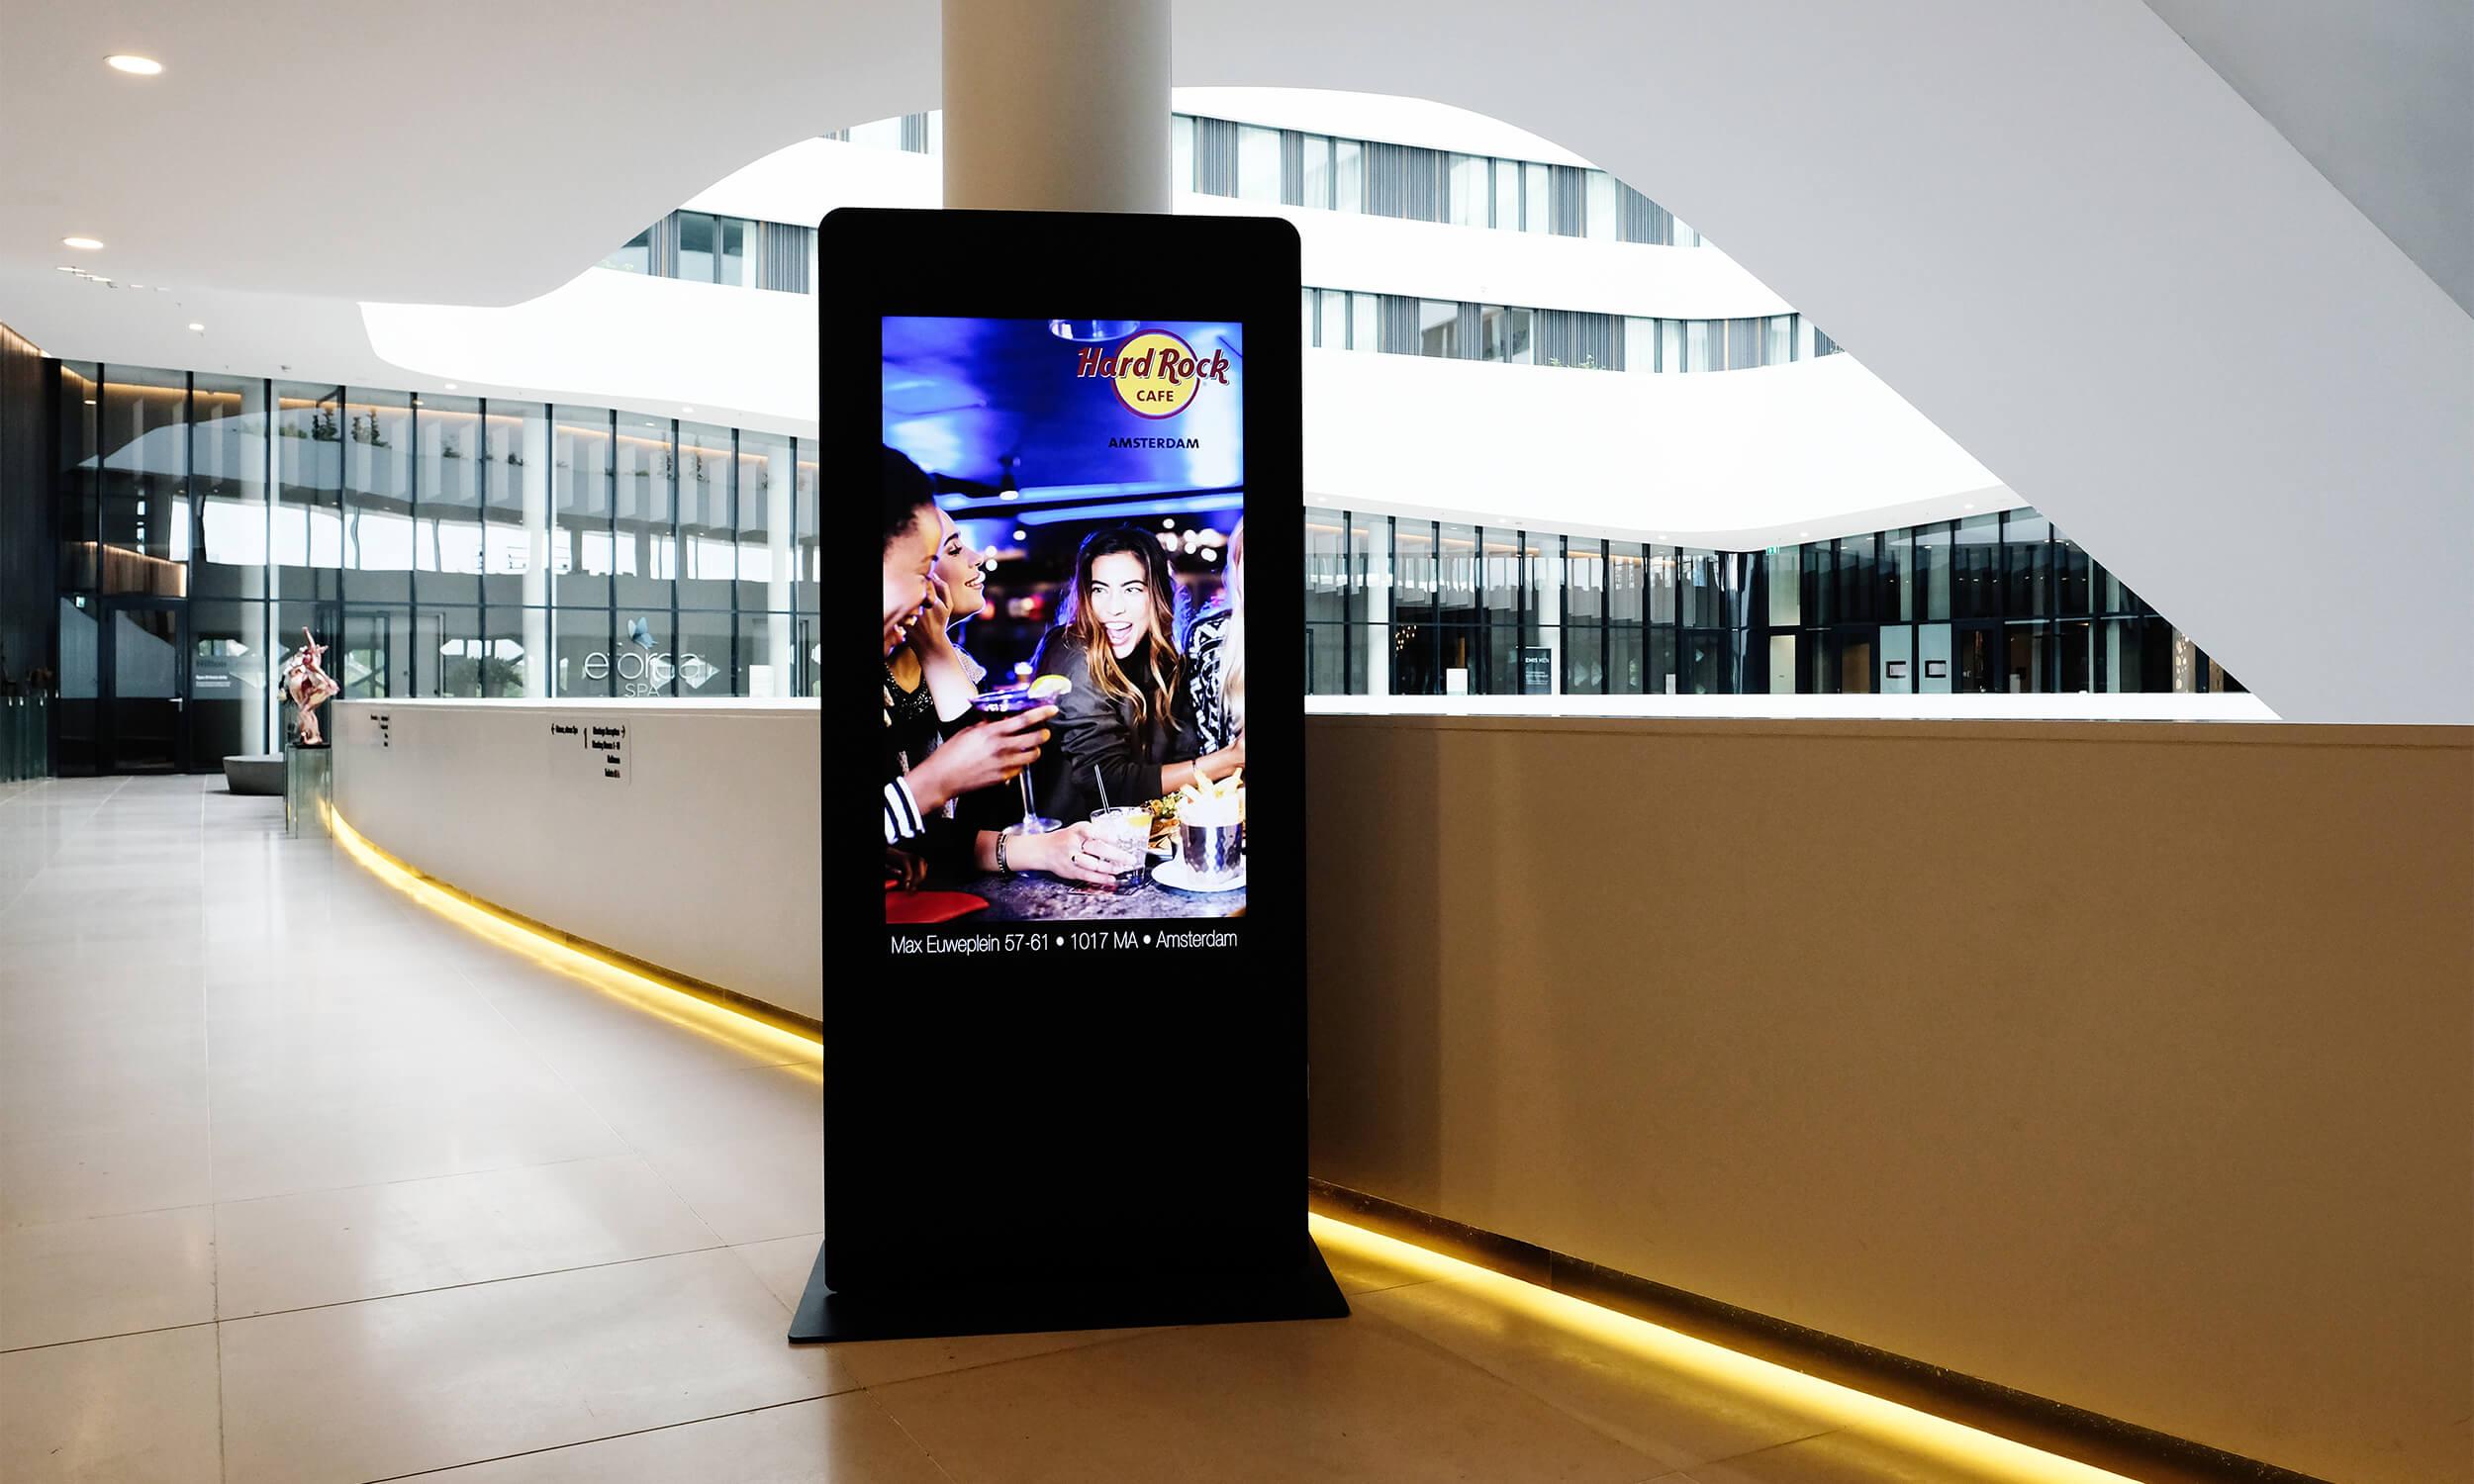 digitaal scherm in lobby Hilton.jpg